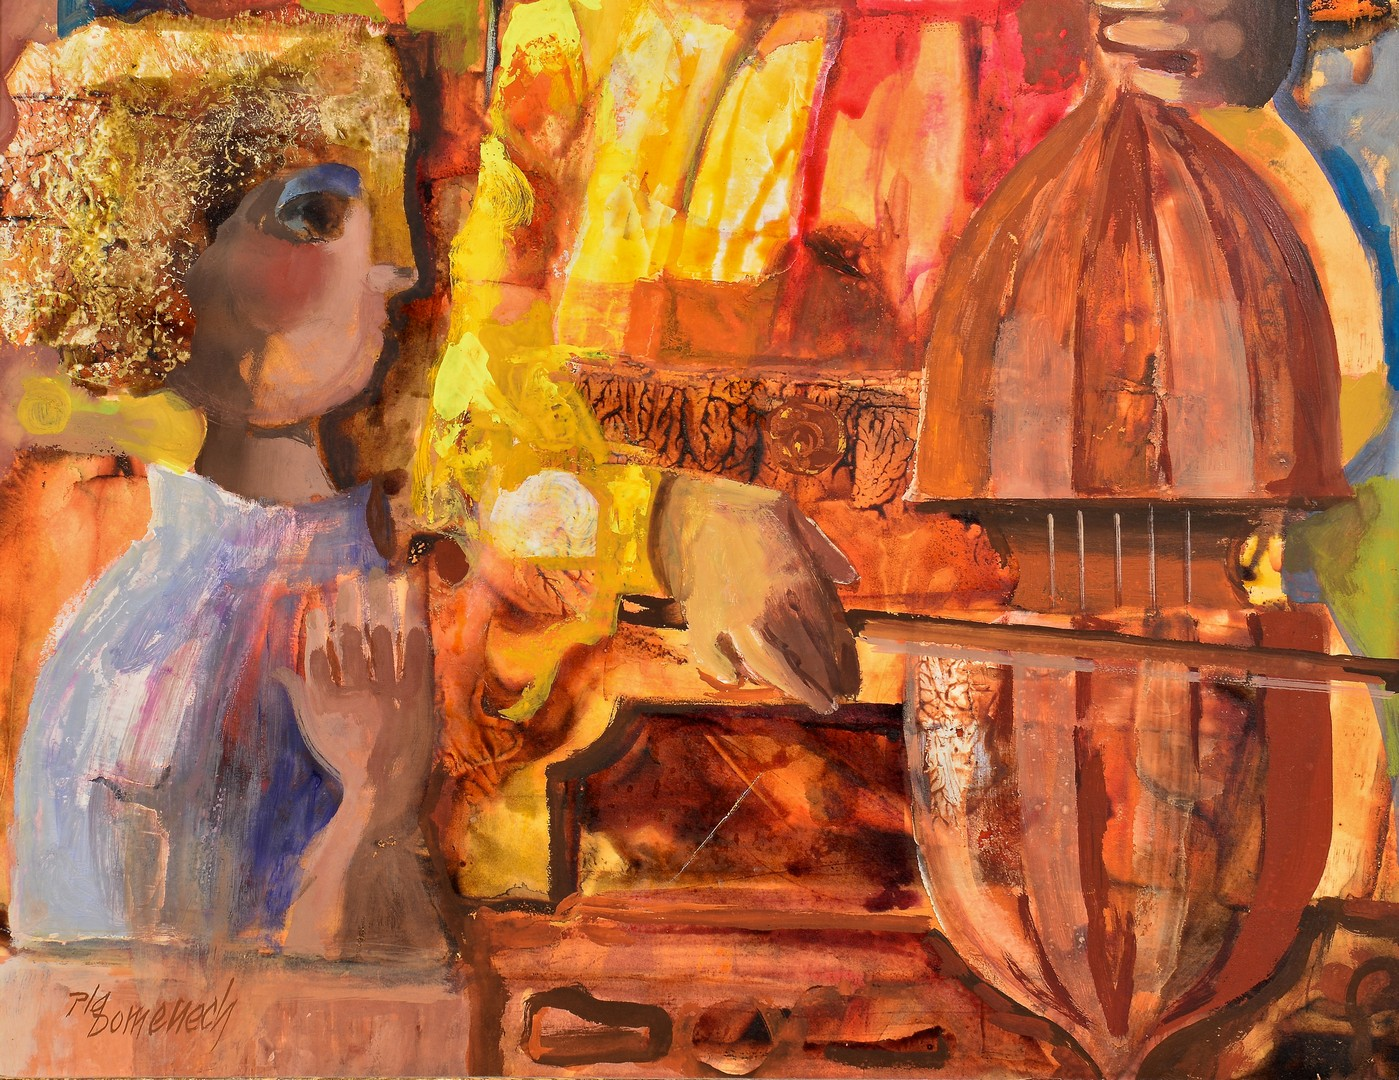 Lot 854: Jordi Domenech Cubist Oil on Board